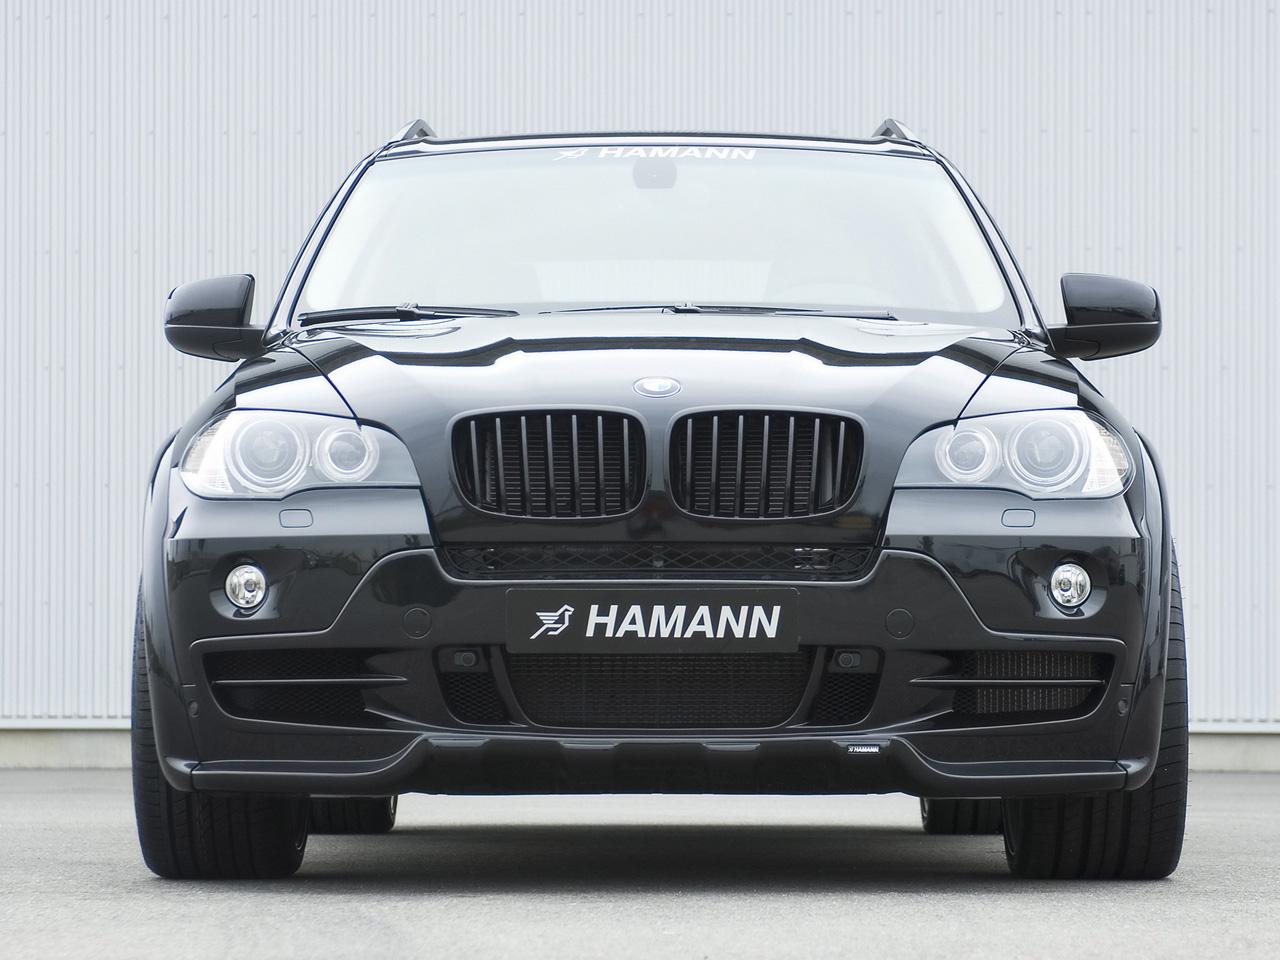 Bmw X5 Body Kit Hamann Www Pixshark Com Images